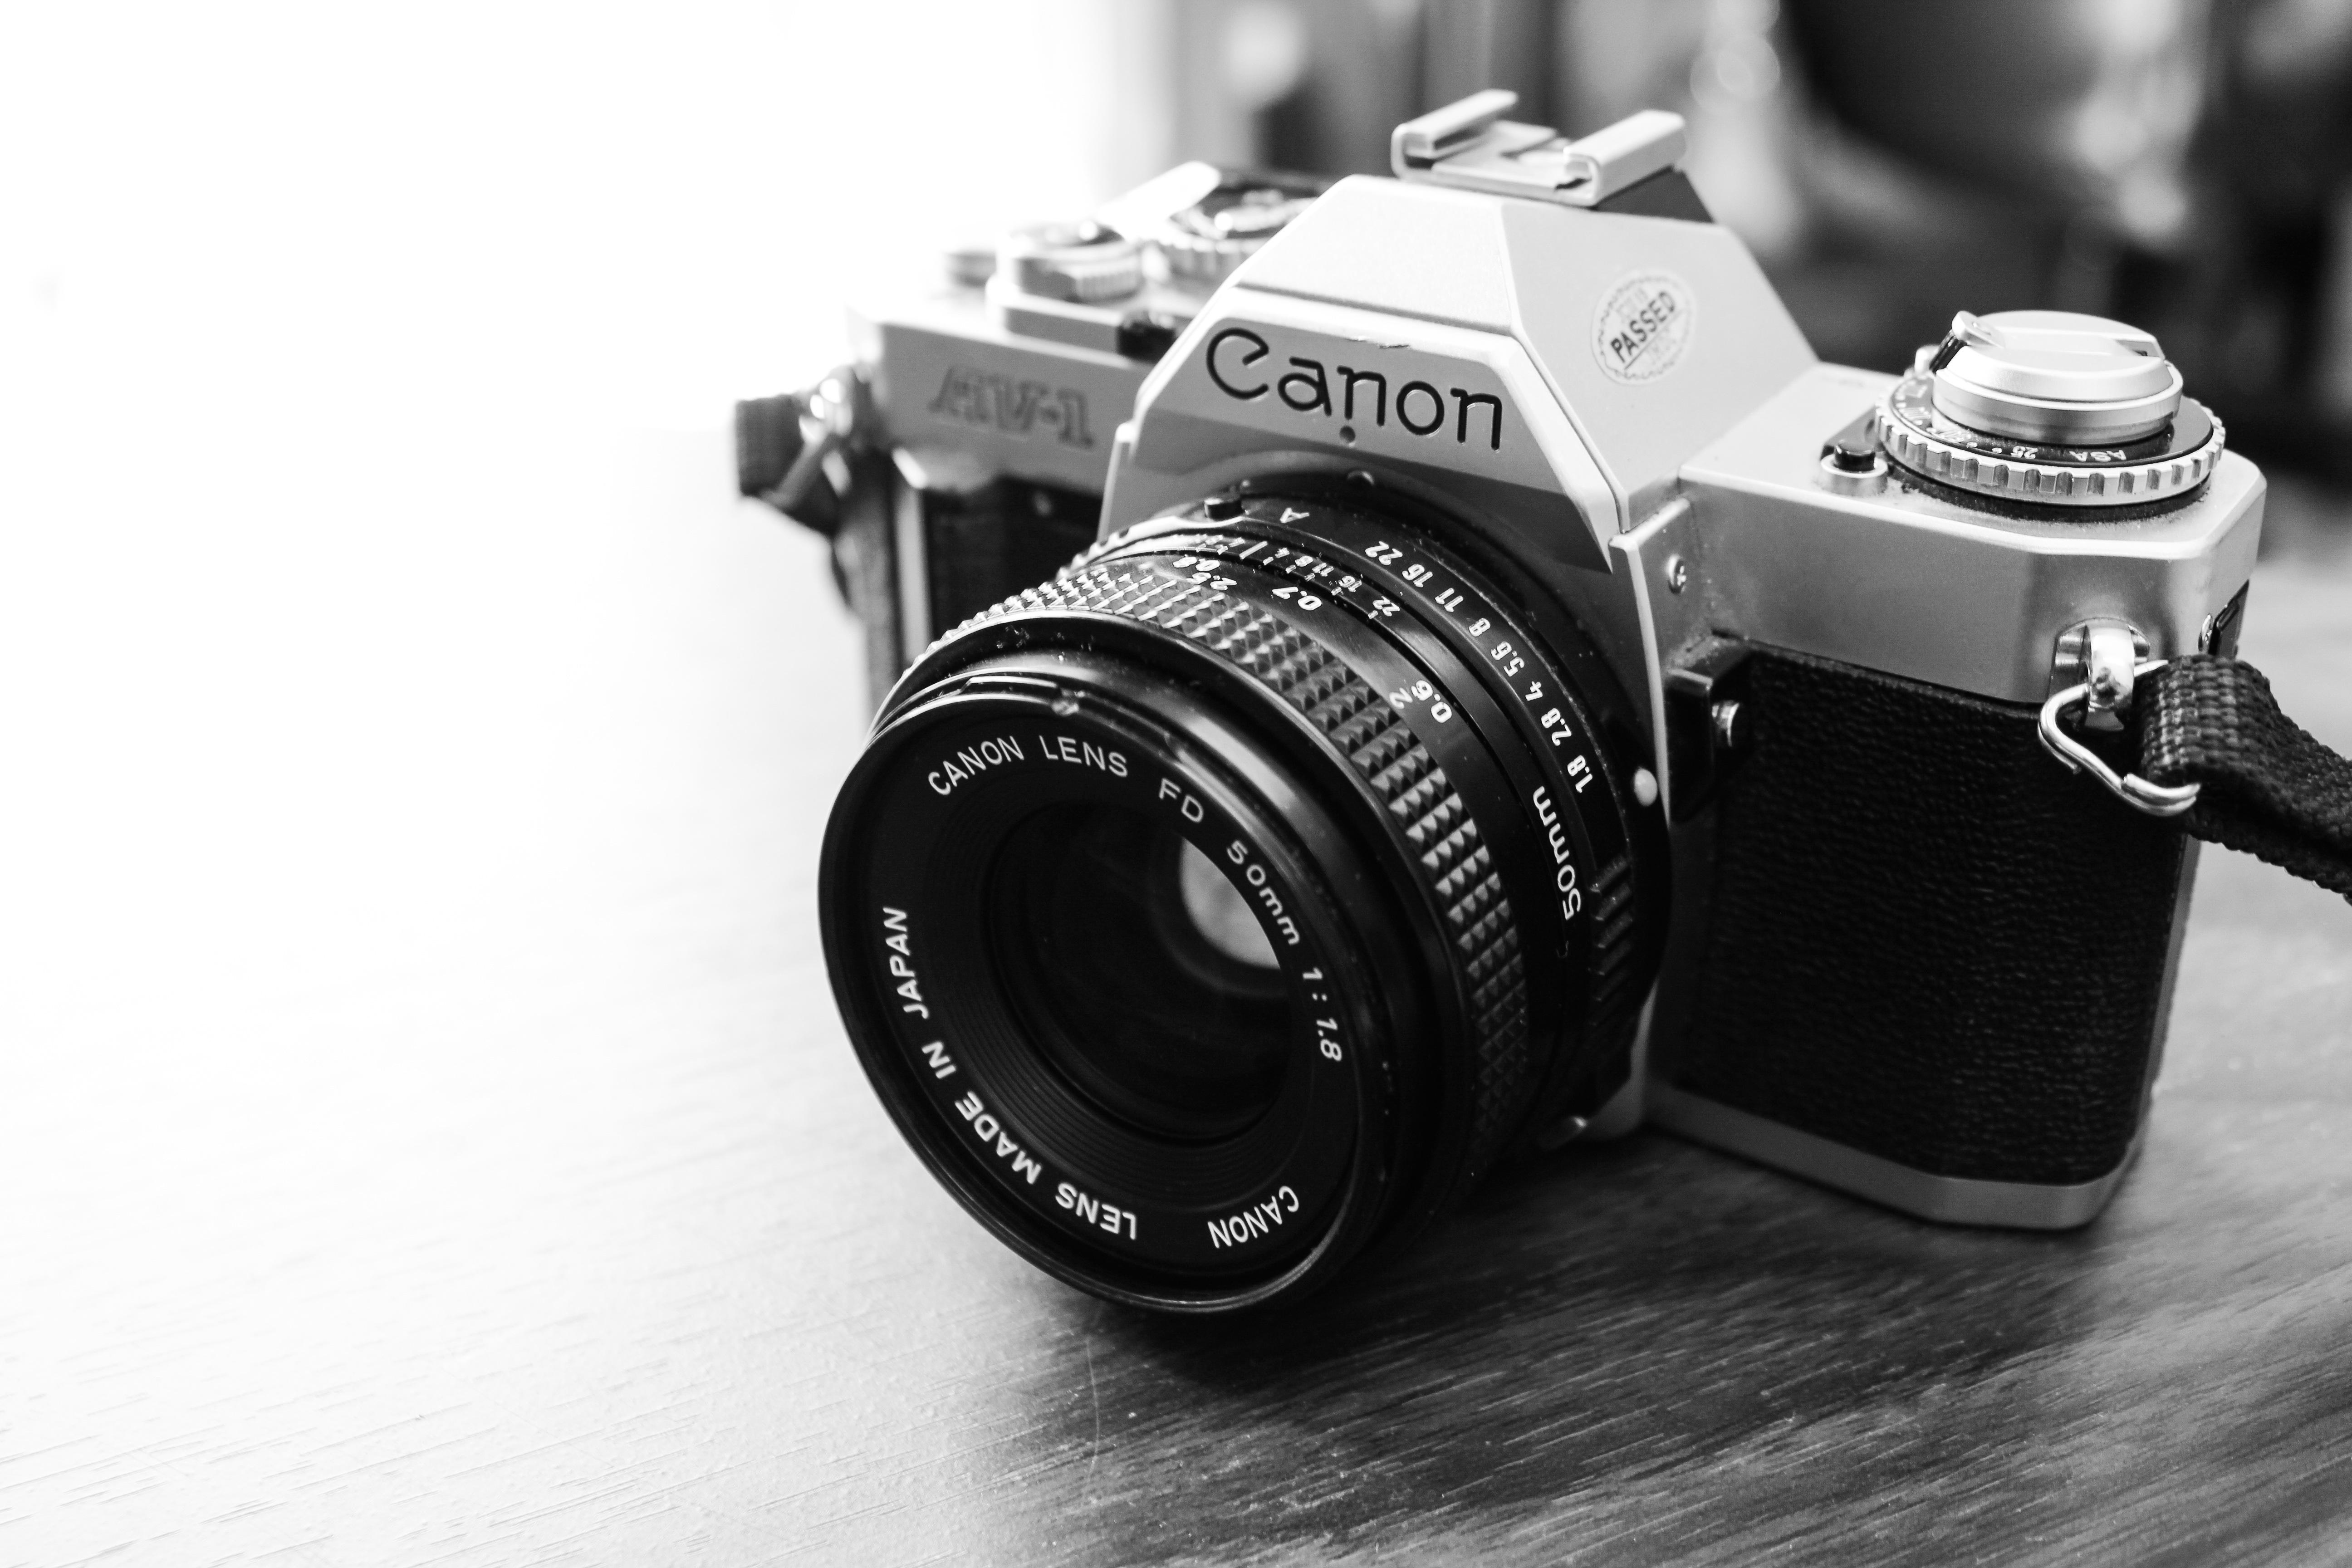 Black retro and white photography